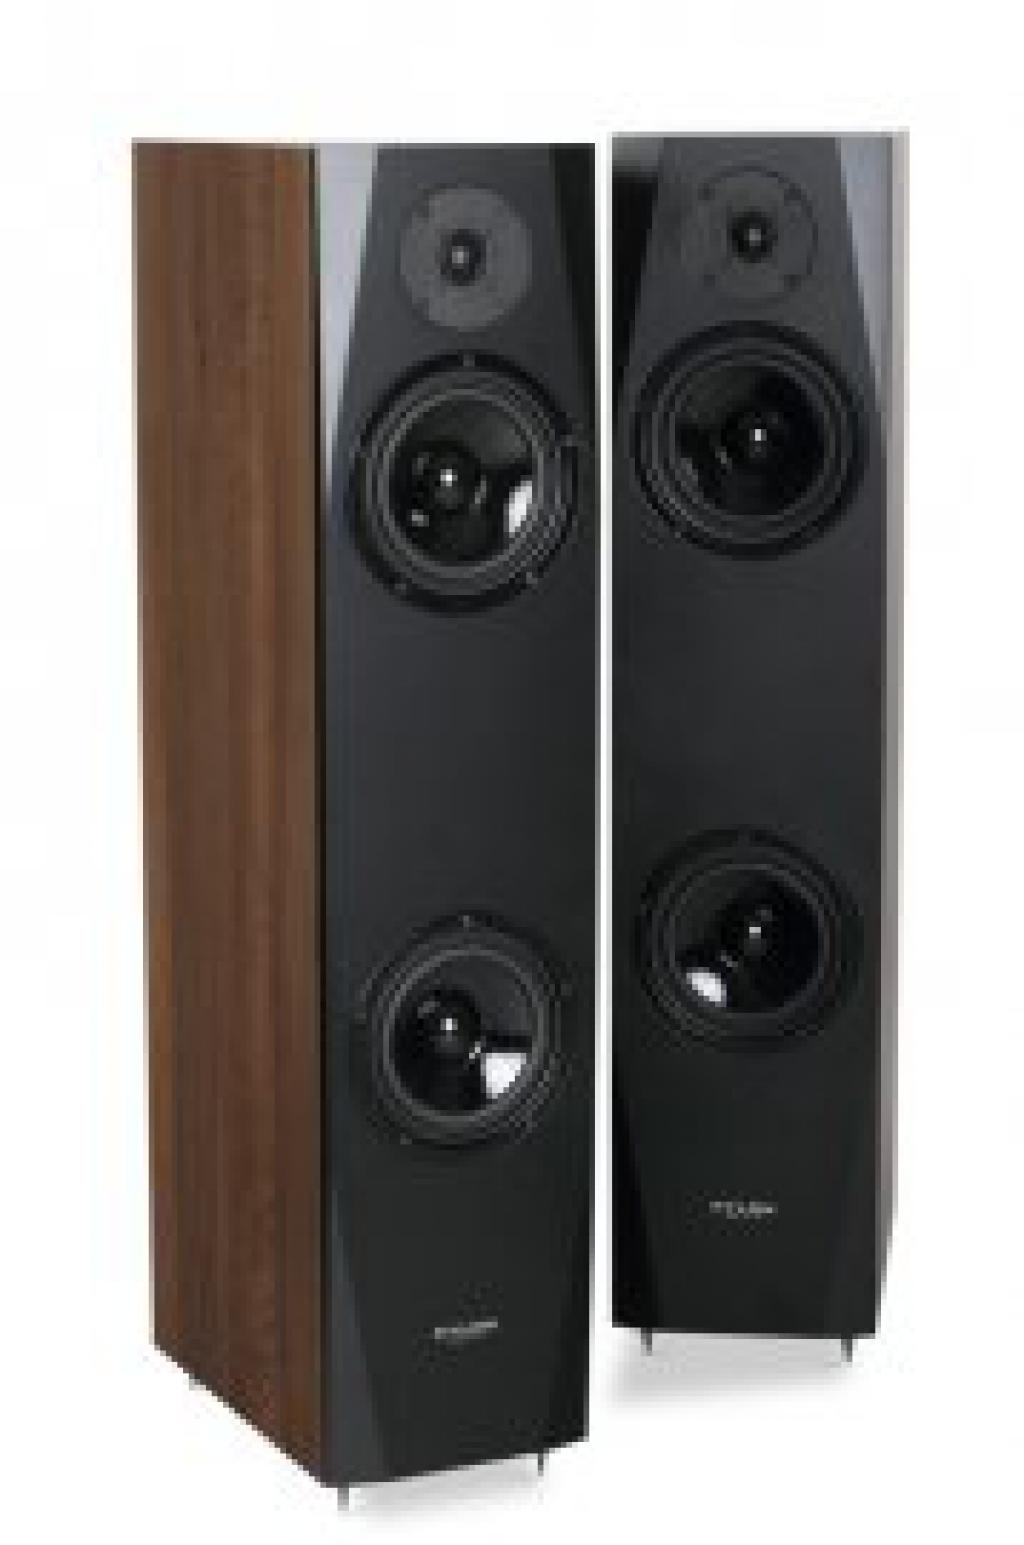 Boxe Pylon Audio Sapphire 25 Walnut